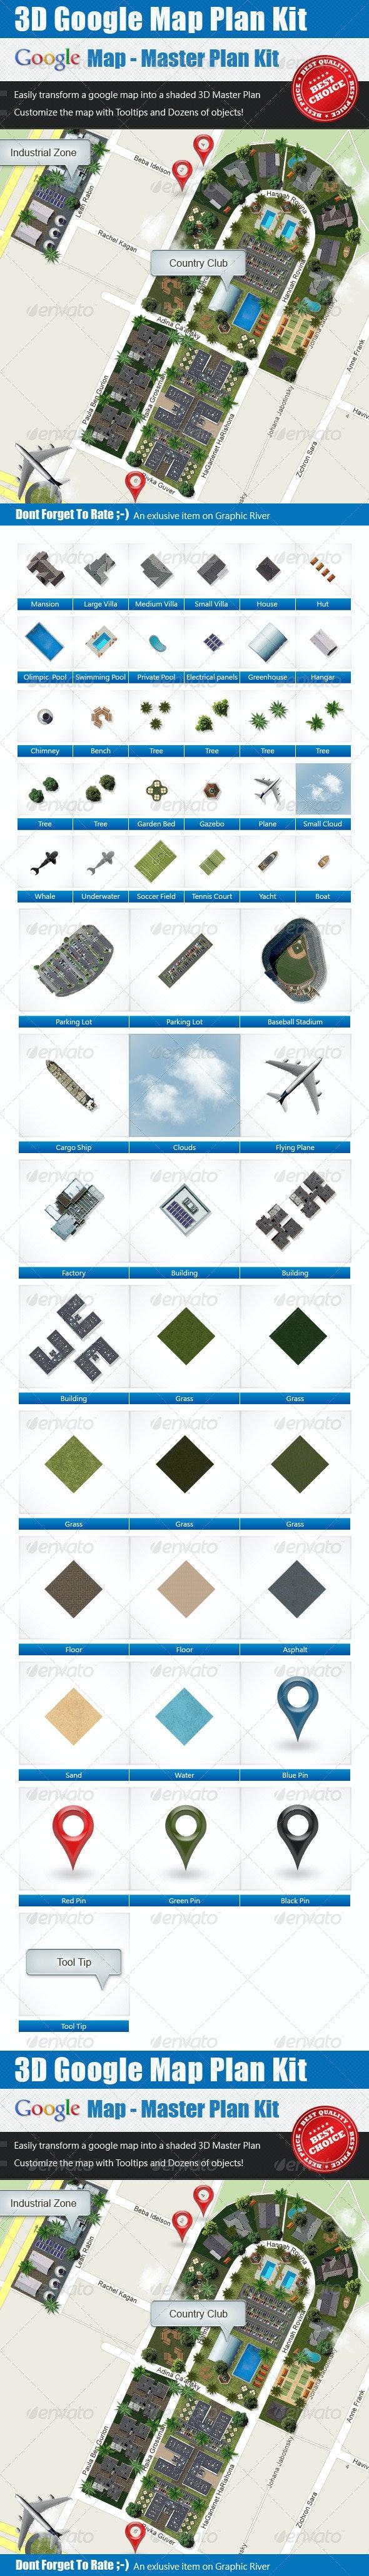 3D Master Plan Kit - Google Map  - Miscellaneous Graphics